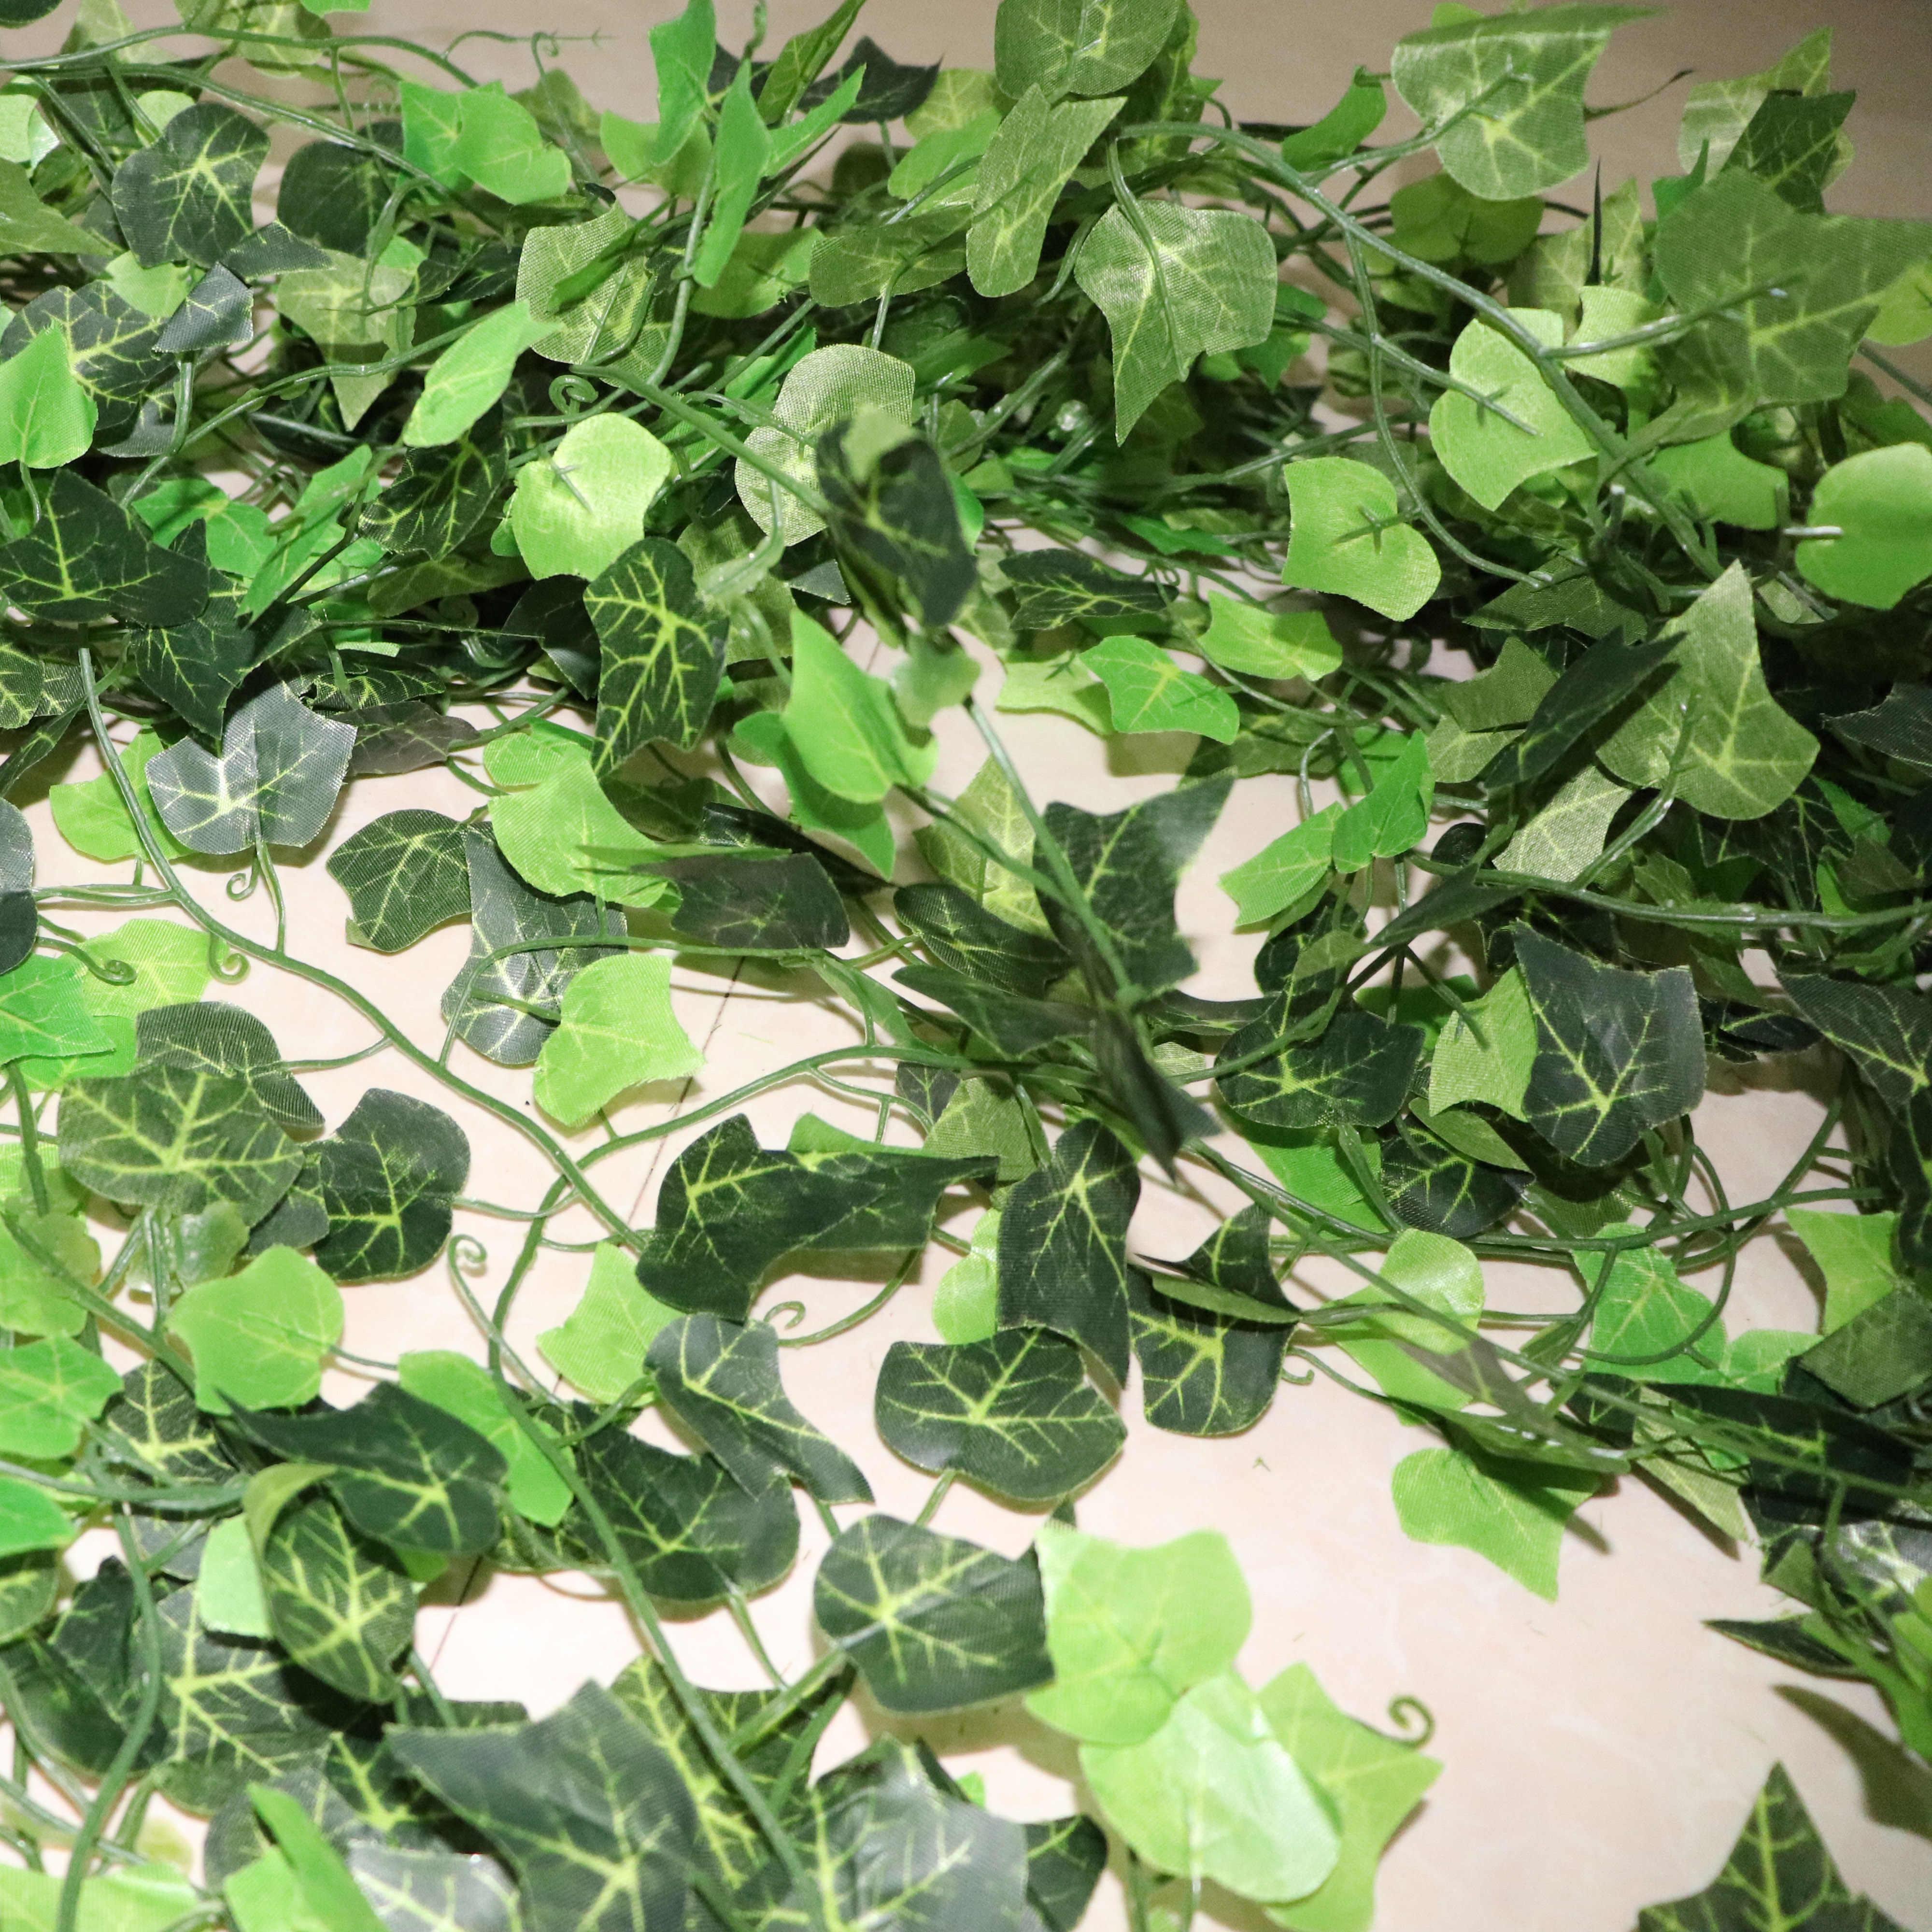 100 Pcs Daun 1 Buah 2.4M Dekorasi Rumah Buatan Ivy Daun Garland Tanaman Vine Fake Dedaunan Bunga Creeper Hijau ivy Karangan Bunga